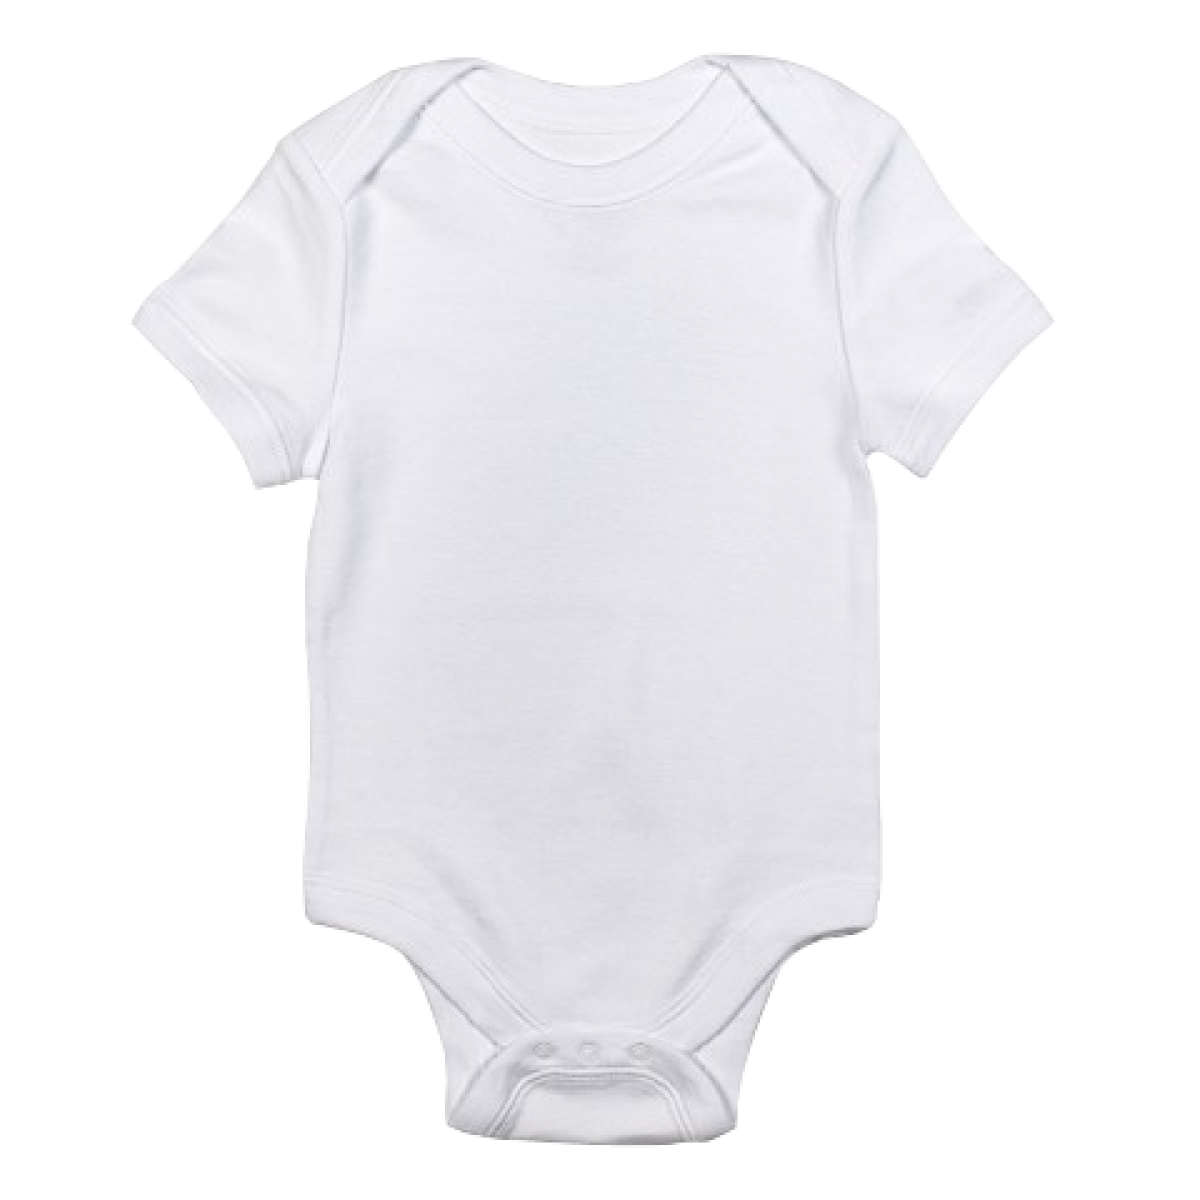 Baby Onesie White Trans.